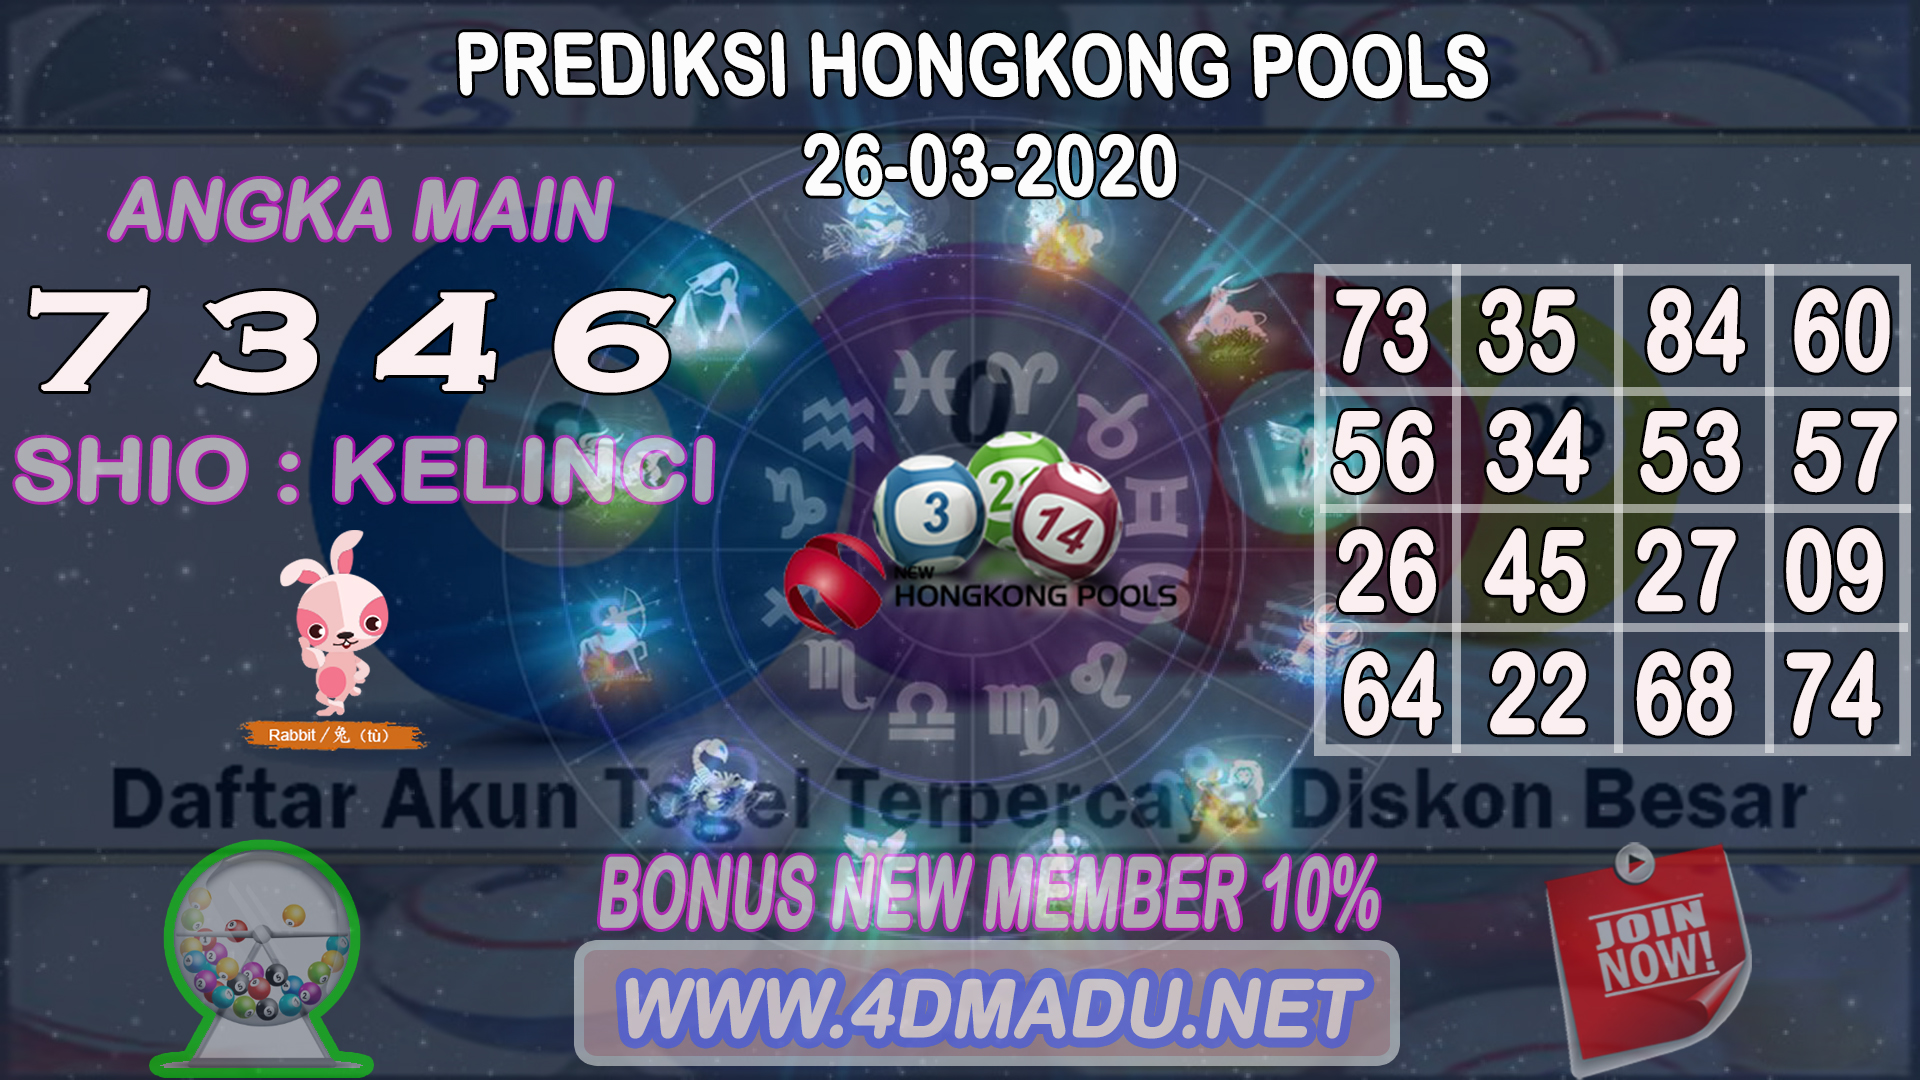 PREDIKSI HONGKONG POOLS 26 MARET 2020